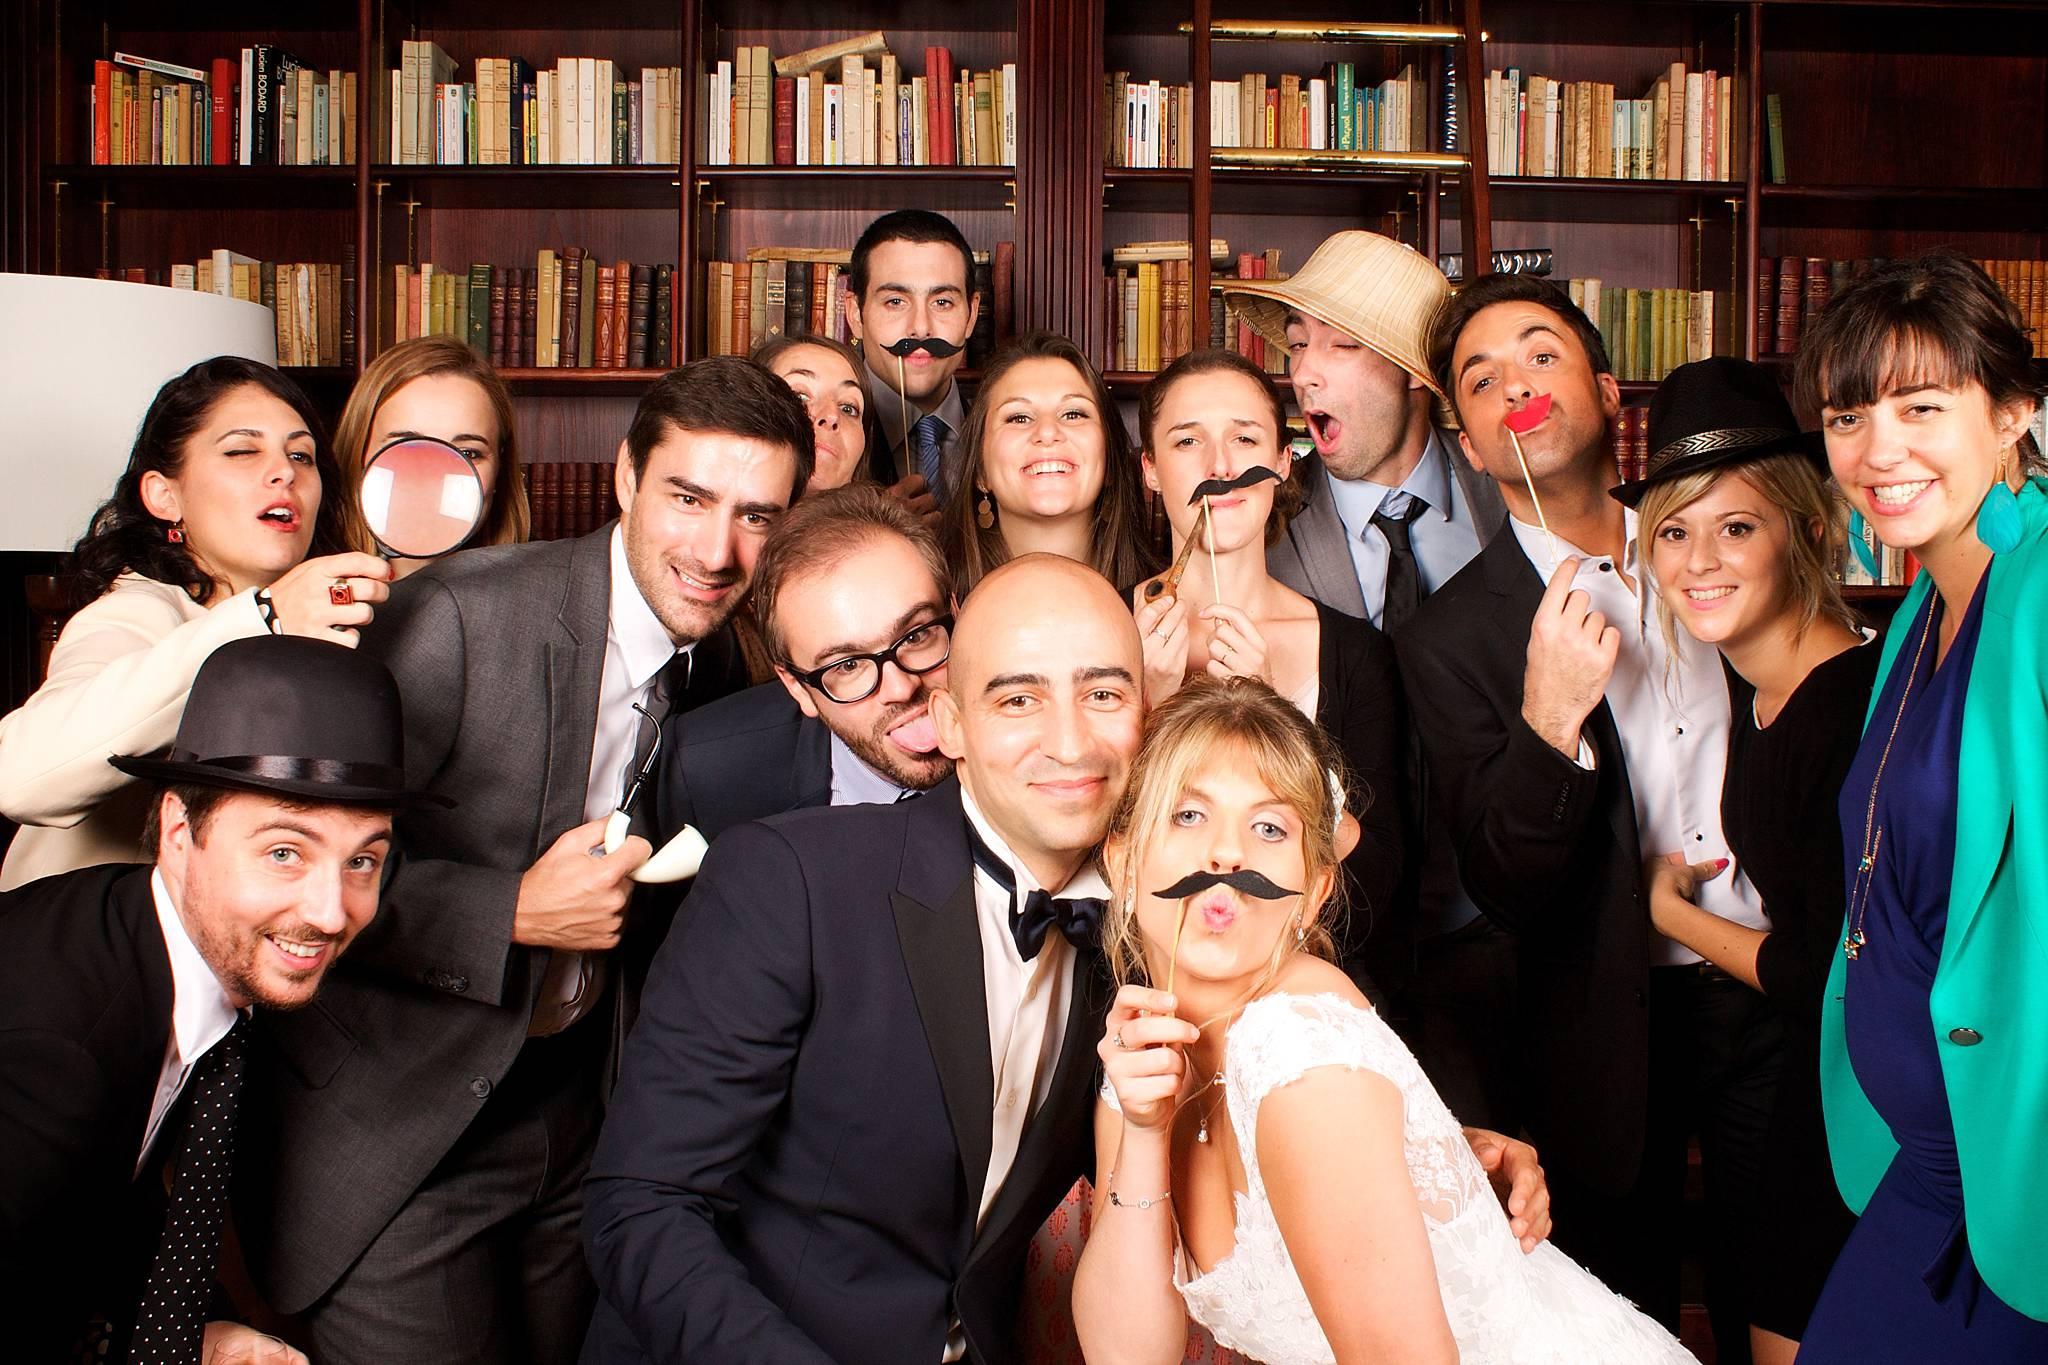 01_photobooth-mariage-bordeaux-gironde-dordogne-charentes-alexandre-roschewitz-photographies_2048px